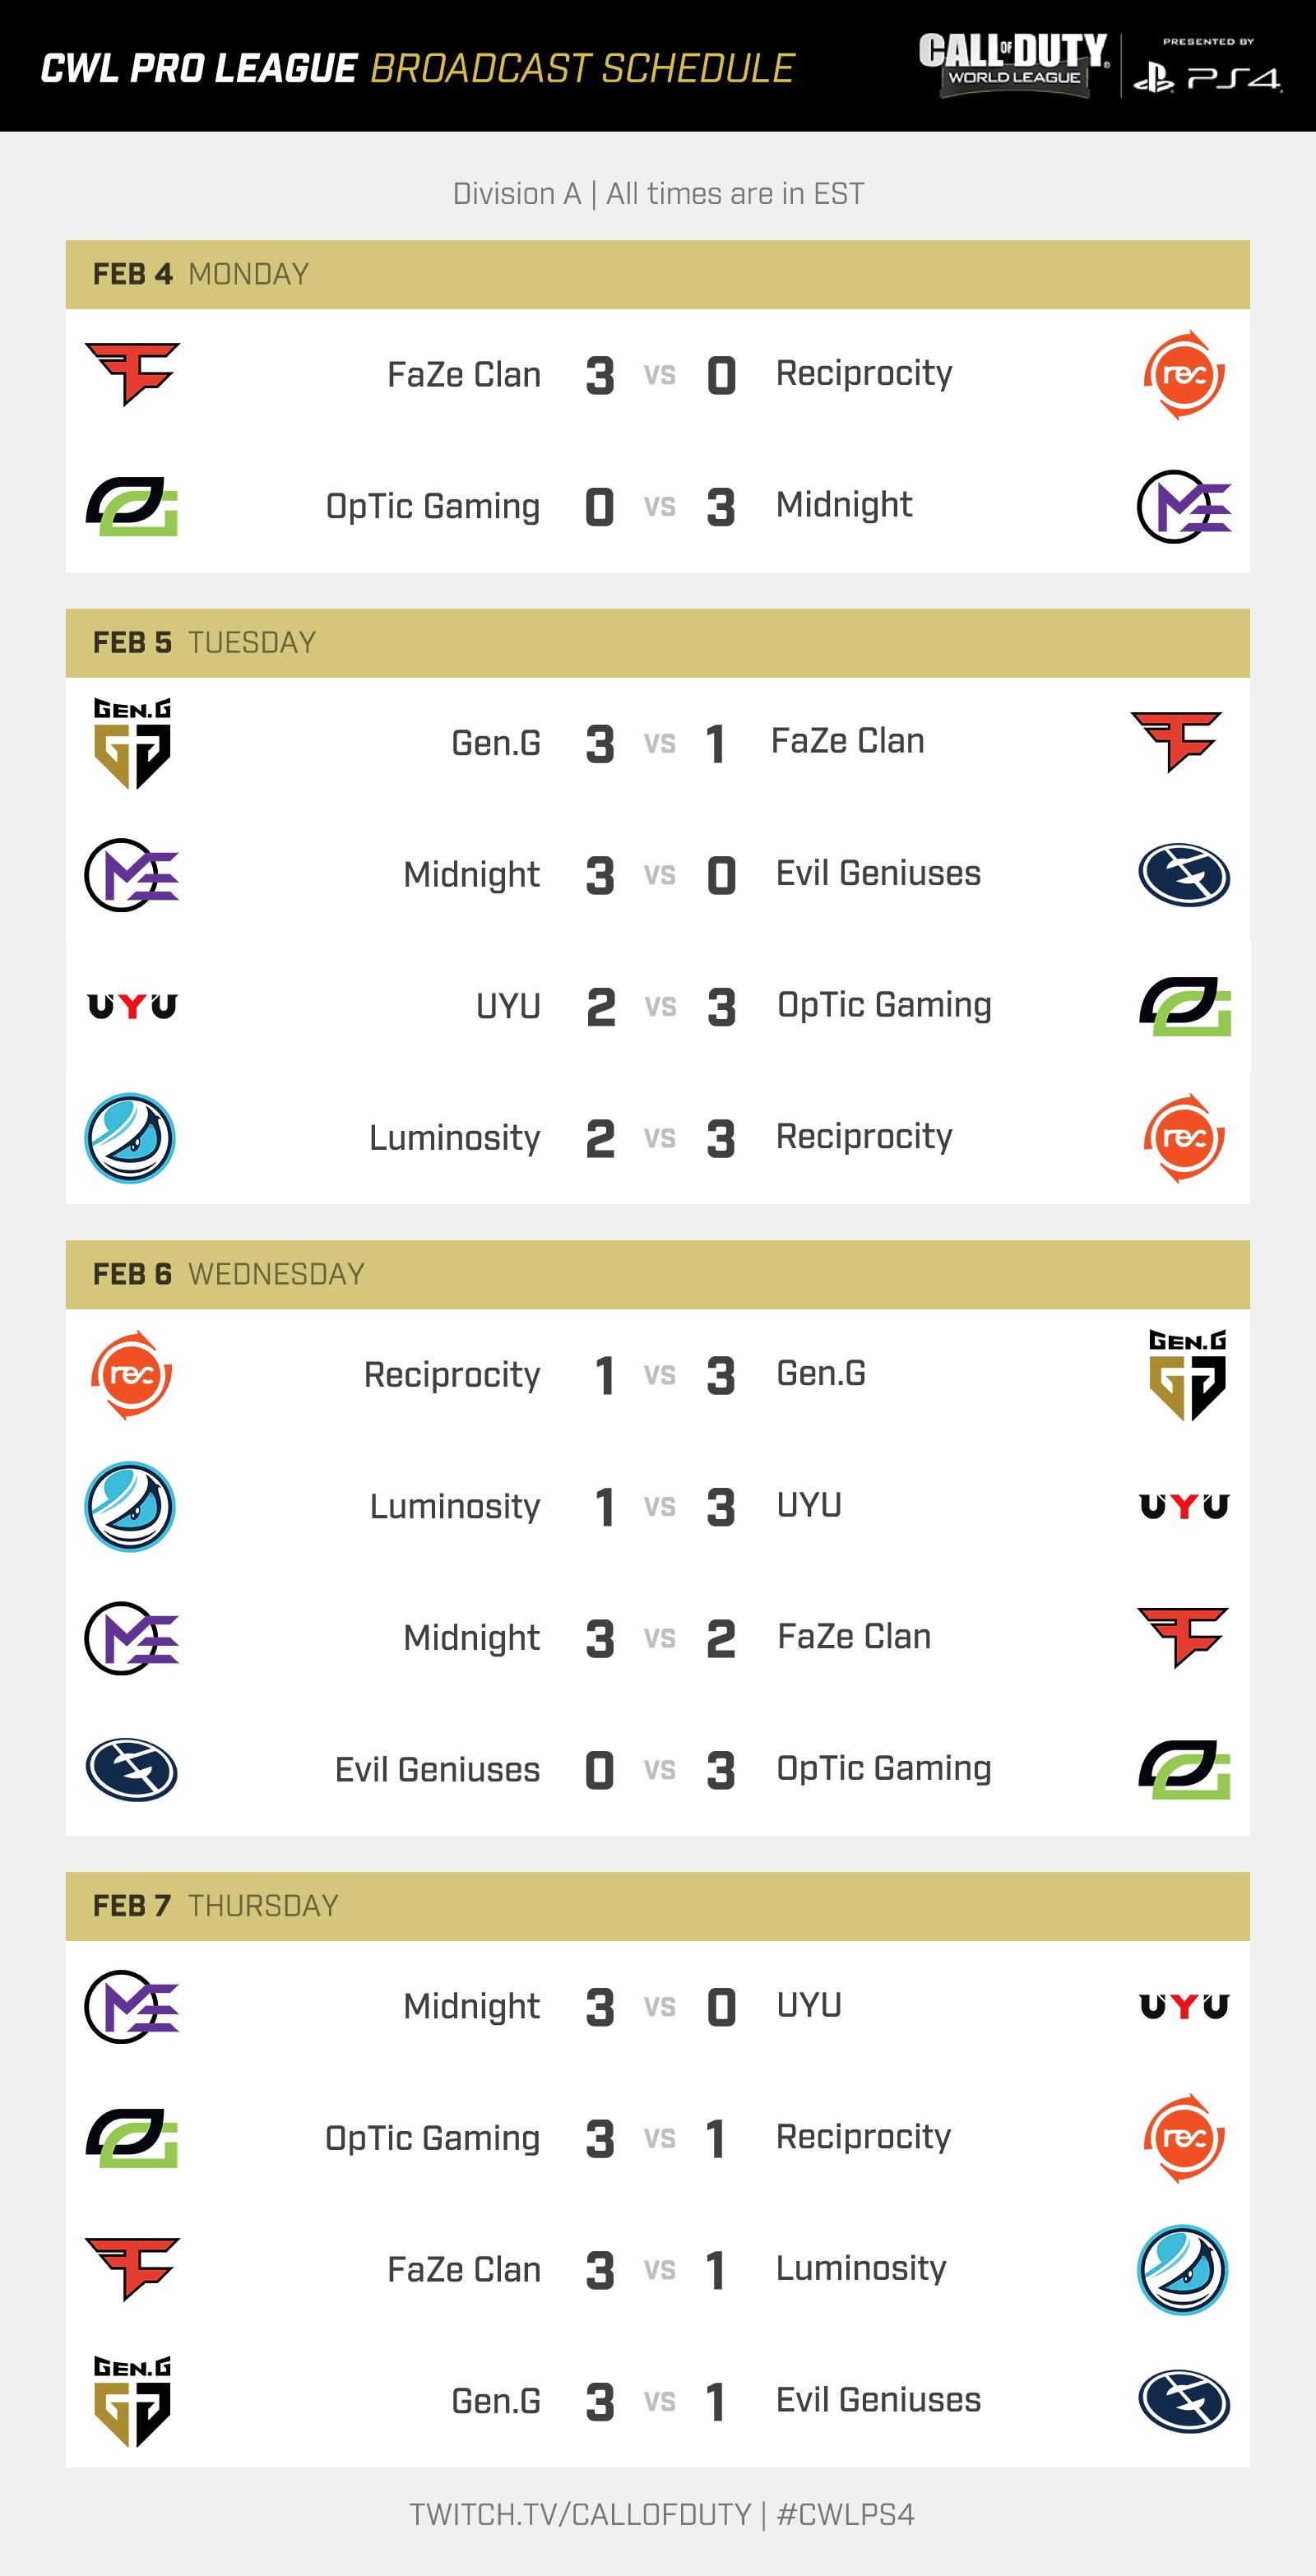 6 team league schedule template  CWL Pro League 2019 Season Schedule Revealed - 6 team league schedule template